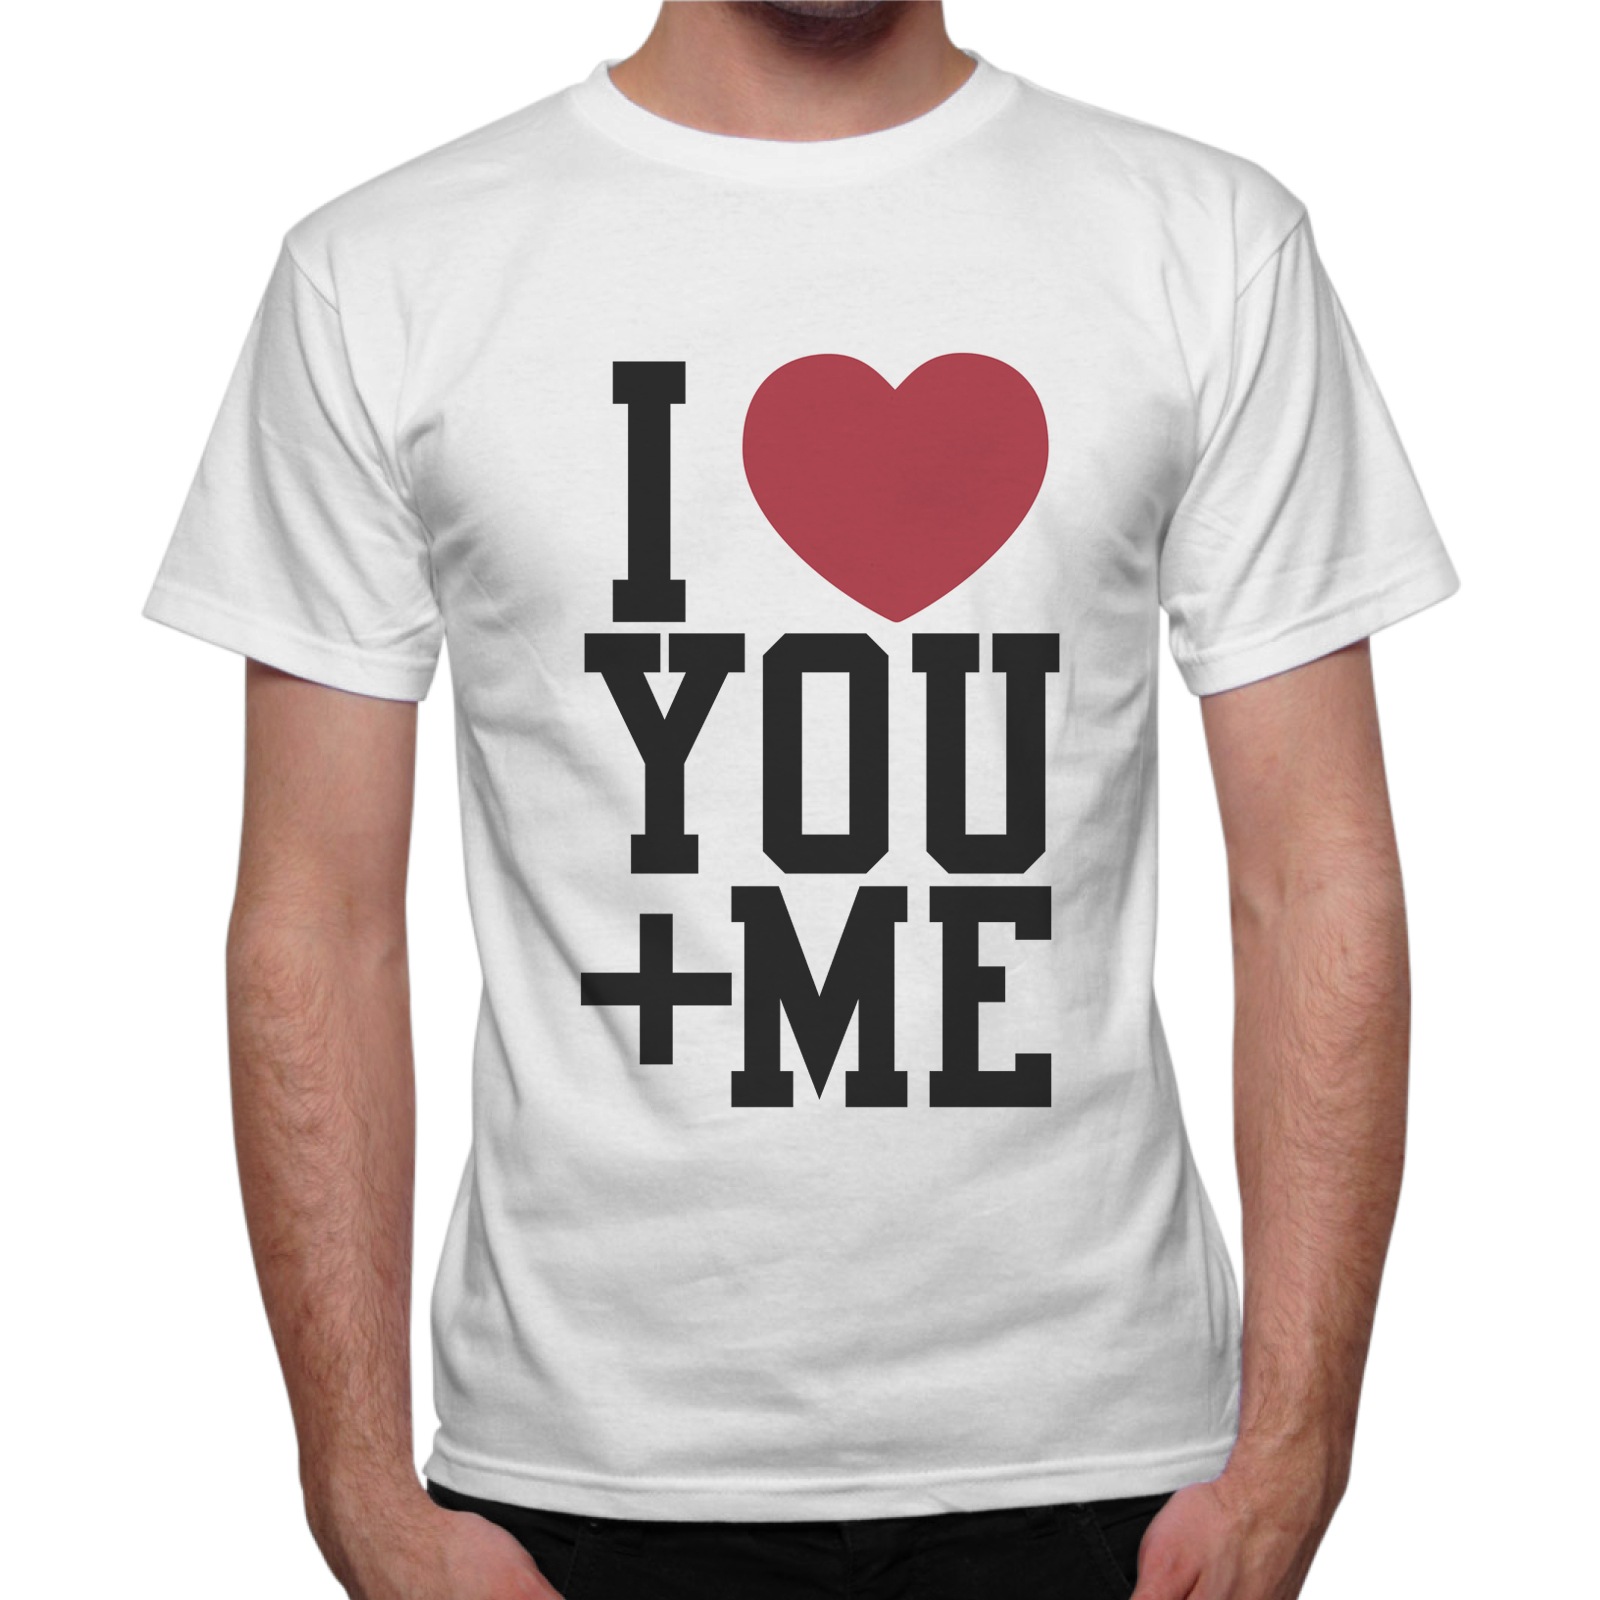 T-Shirt Uomo I LOVE YOU + ME